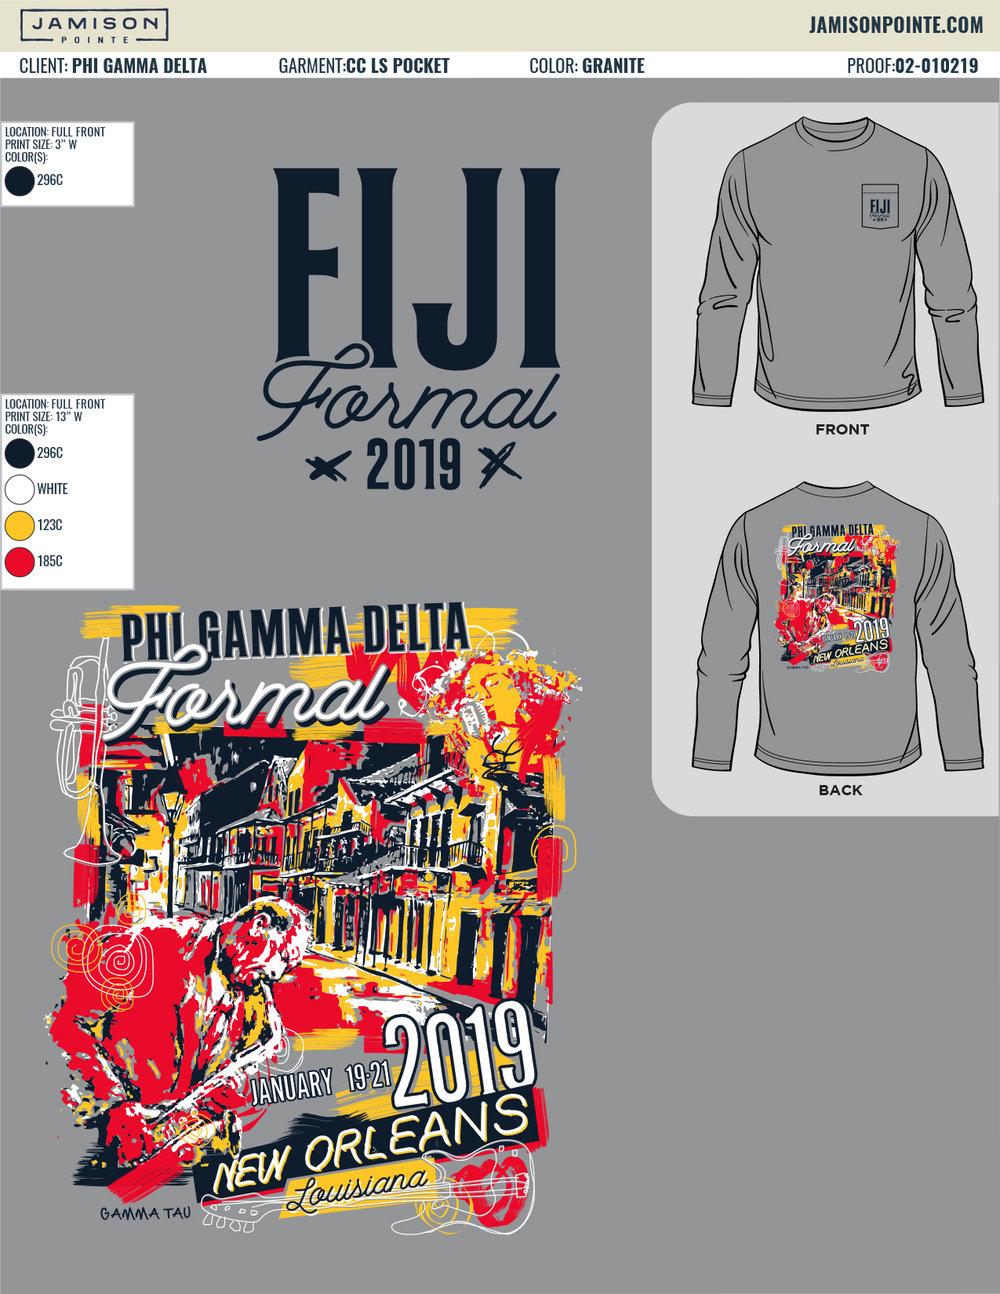 02-010219 Phi Gamma Delta Georgia Tech Spring Formal 2019 PROOF-2.jpg